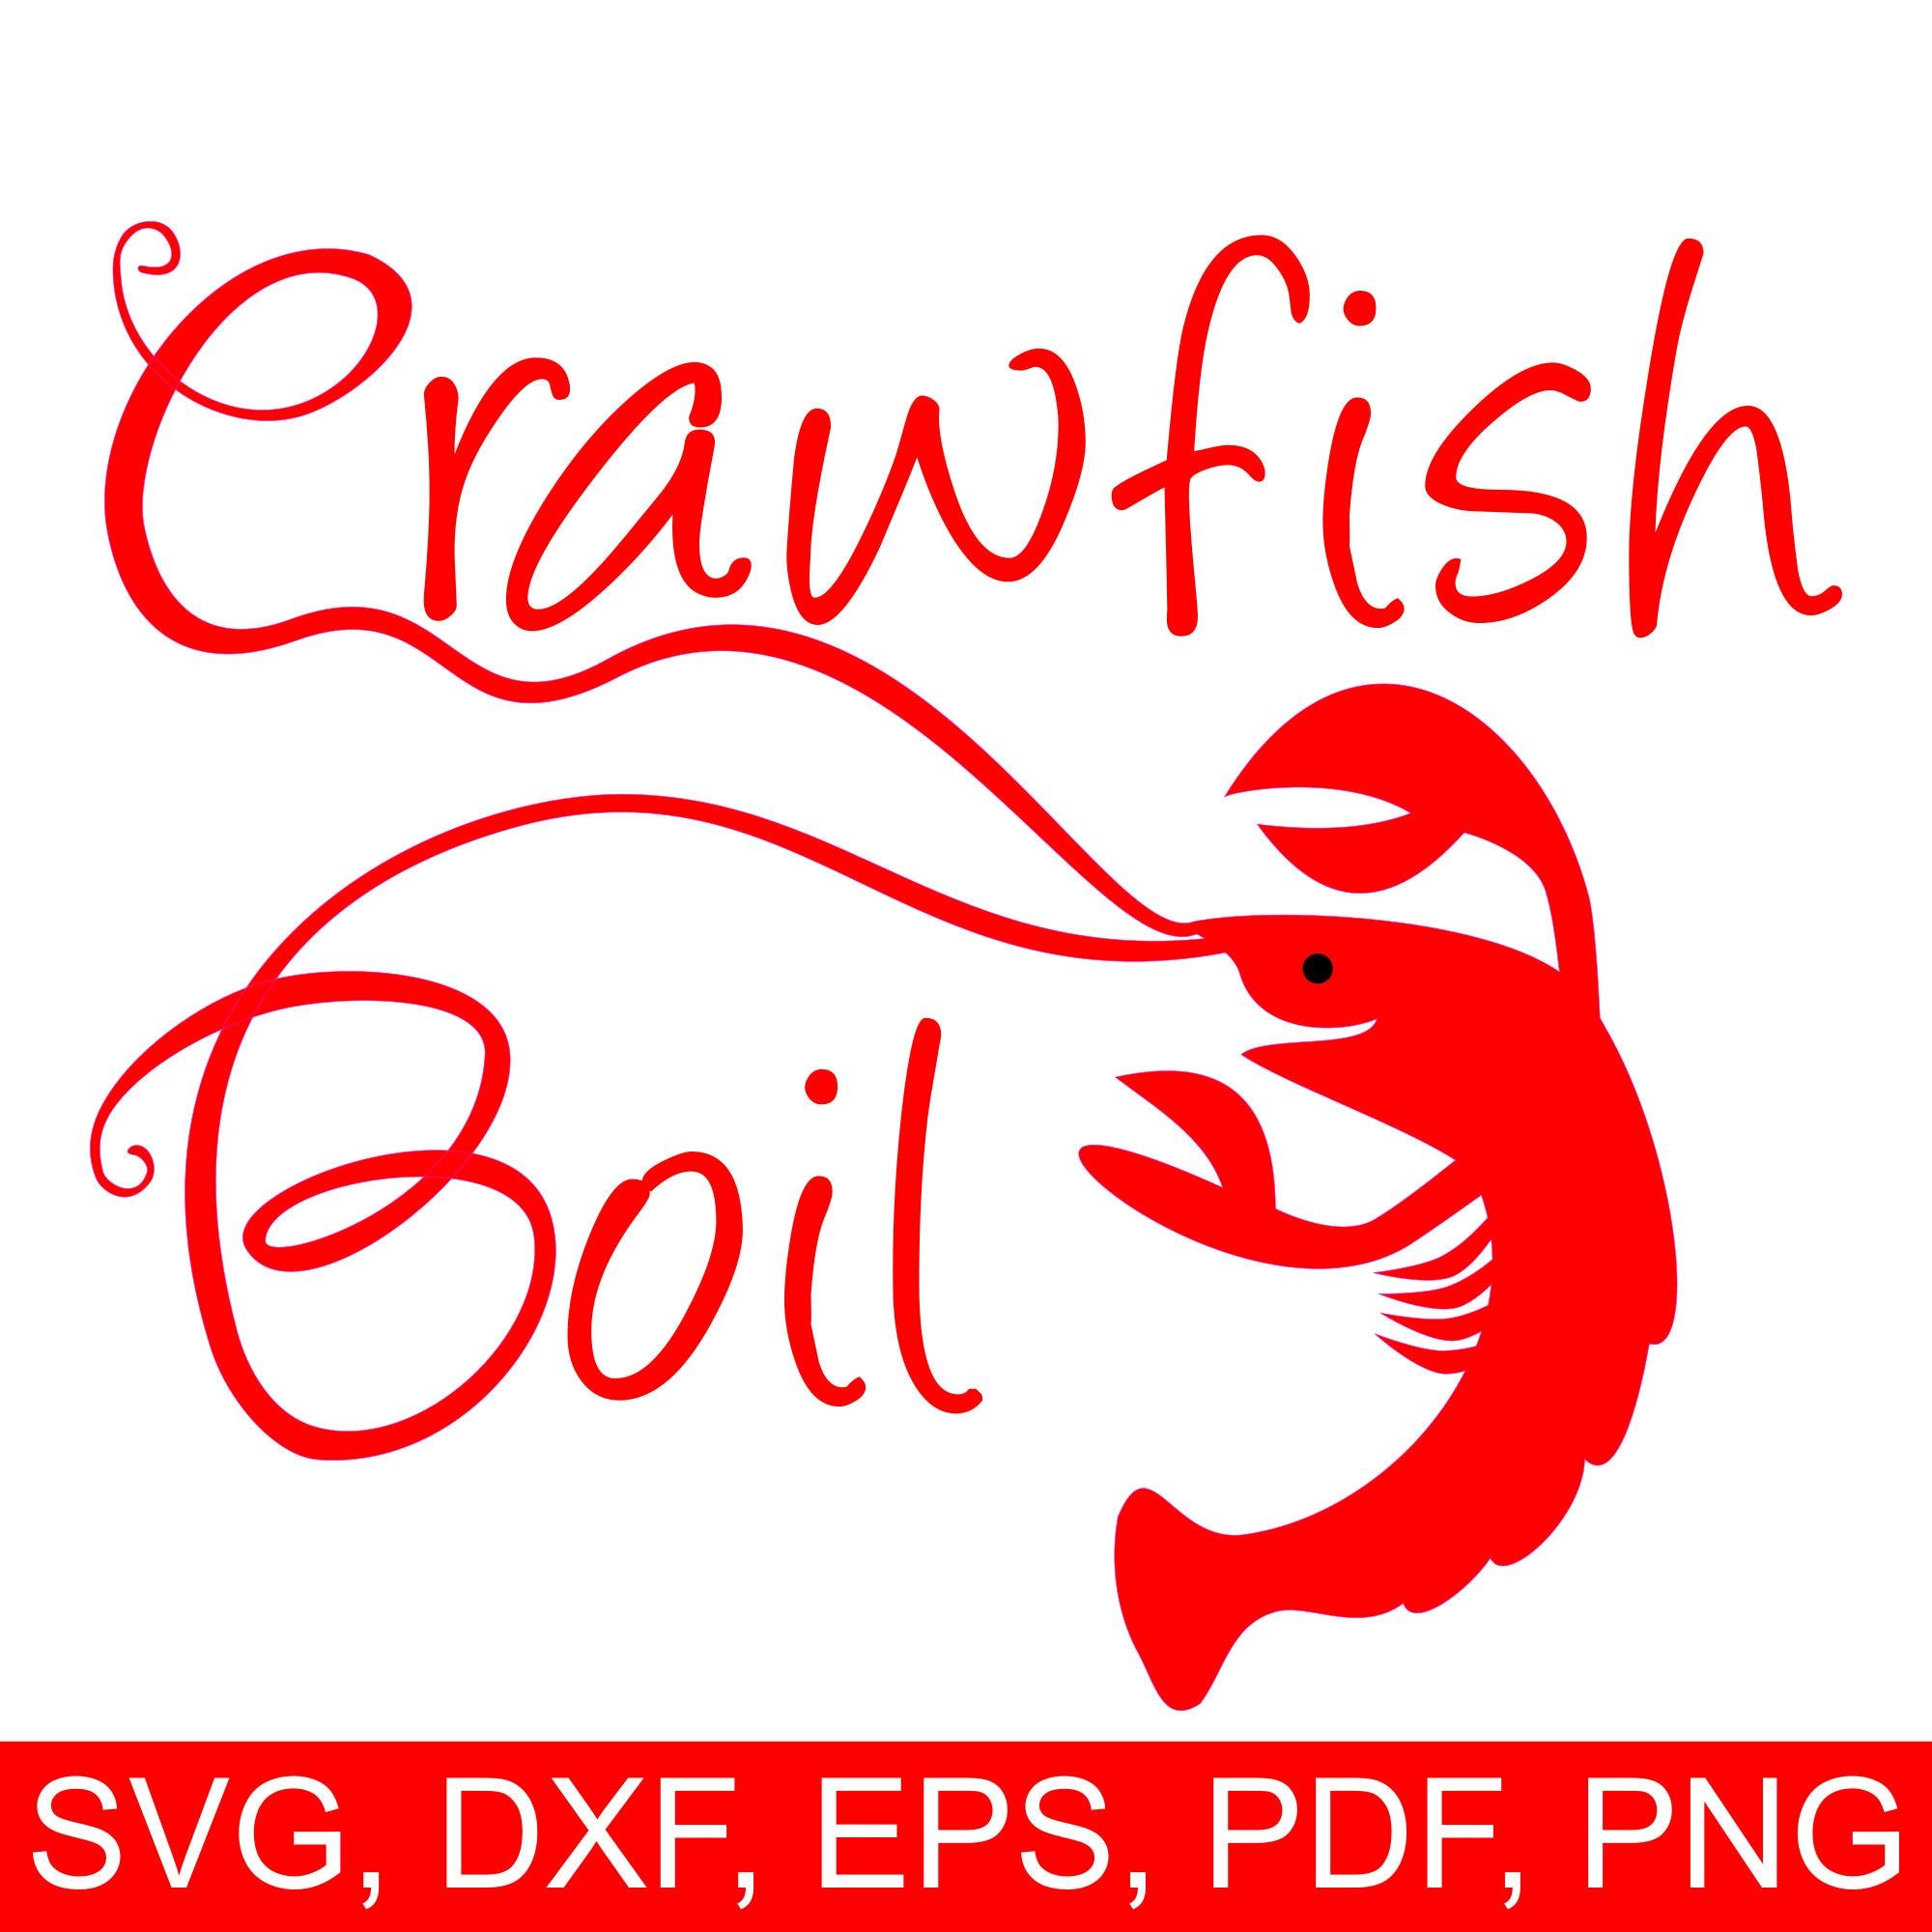 crawfish boil svg file and printable crawfish boil invitation clipart rh perfectcutsvgfiles com Crawfish Boil Cartoon crawfish boil clipart